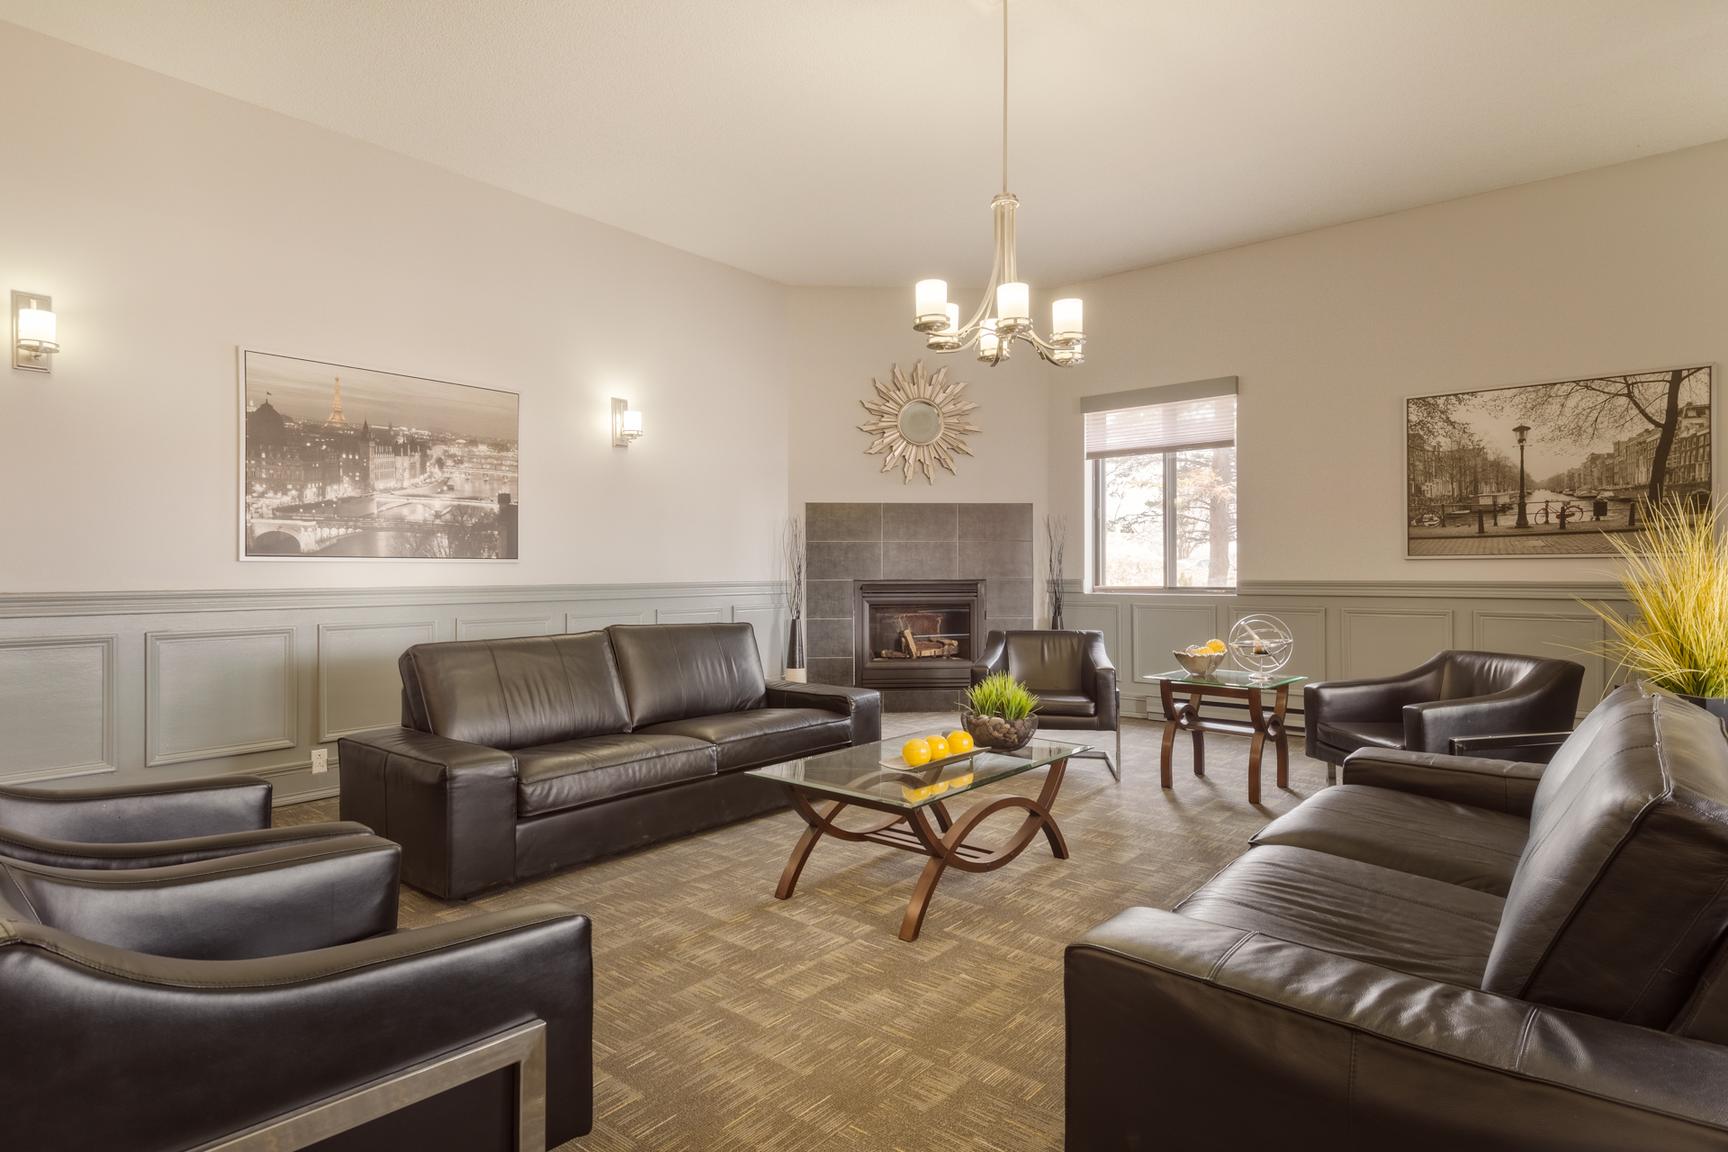 1 bedroom Apartments for rent in Laval at Le Quatre Cent - Photo 24 - RentersPages – L407183